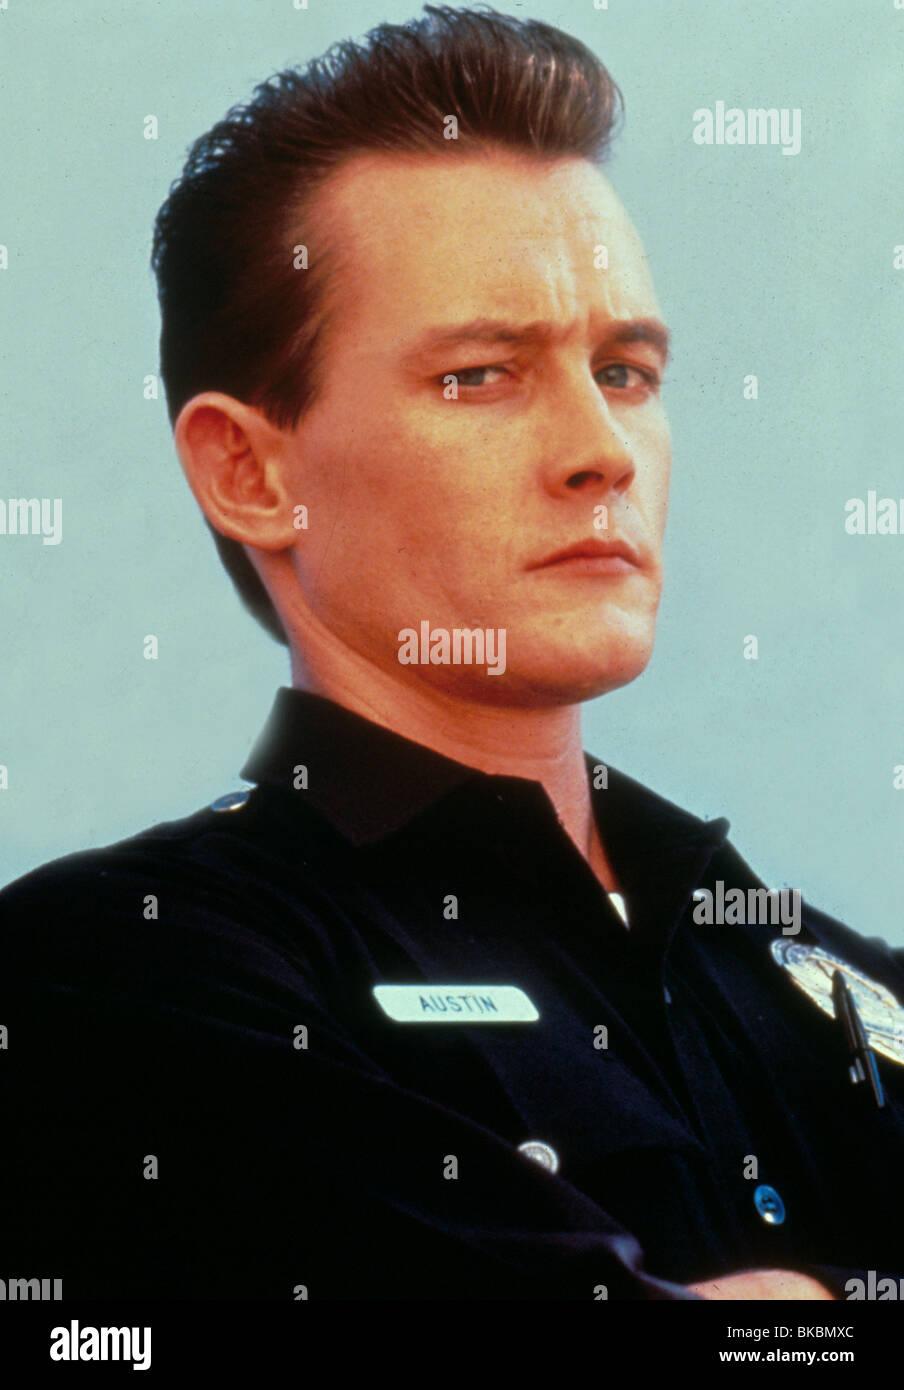 TERMINATOR 2: JUDGEMENT DAY (1991) ROBERT PATRICK TR2 155 - Stock Image